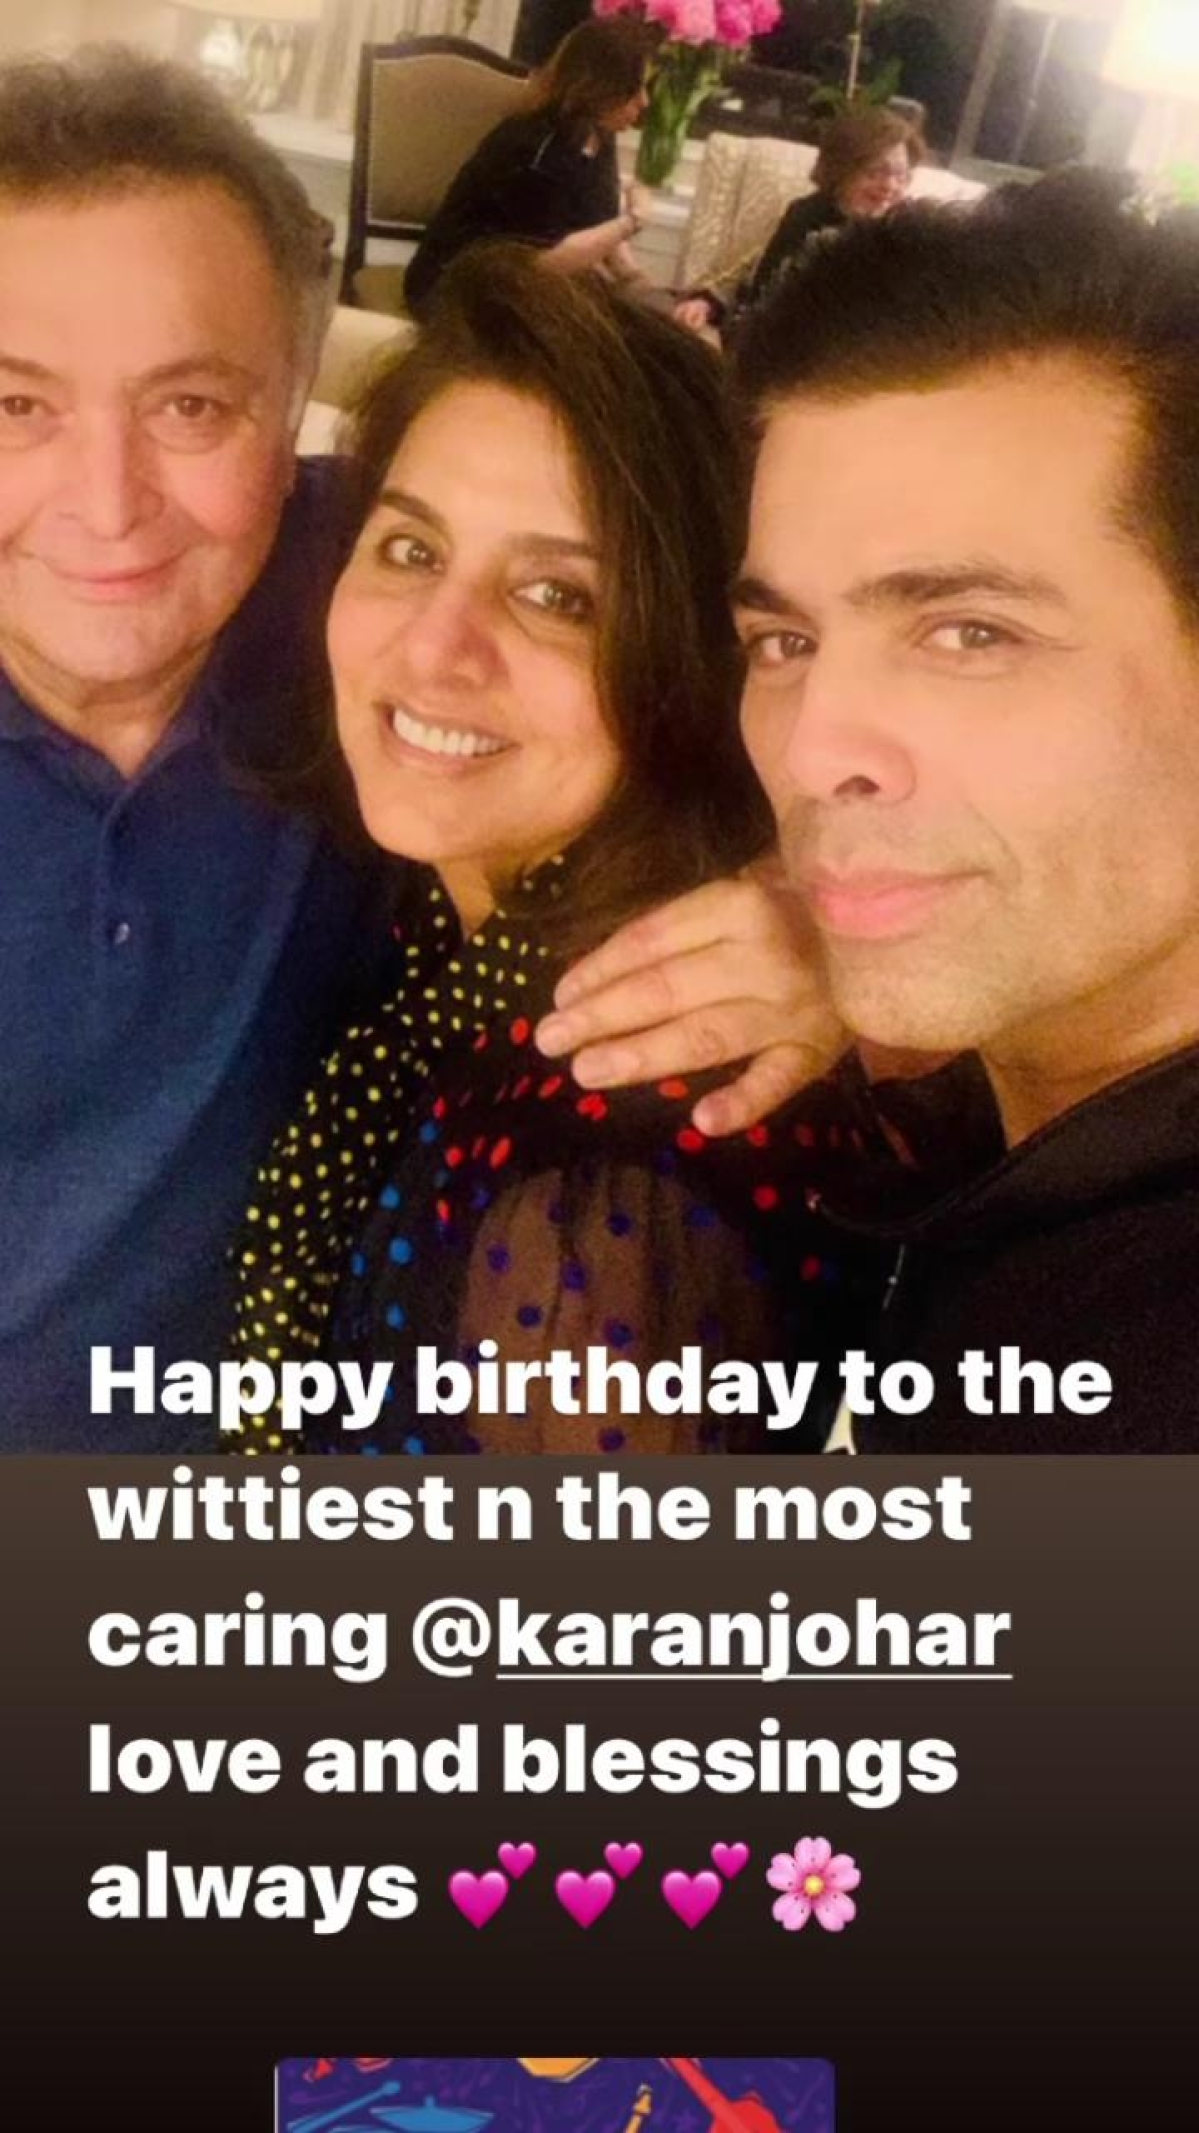 From Kareena to Kajol, B-town celebs shower Karan Johar with birthday wishes as he turns 49